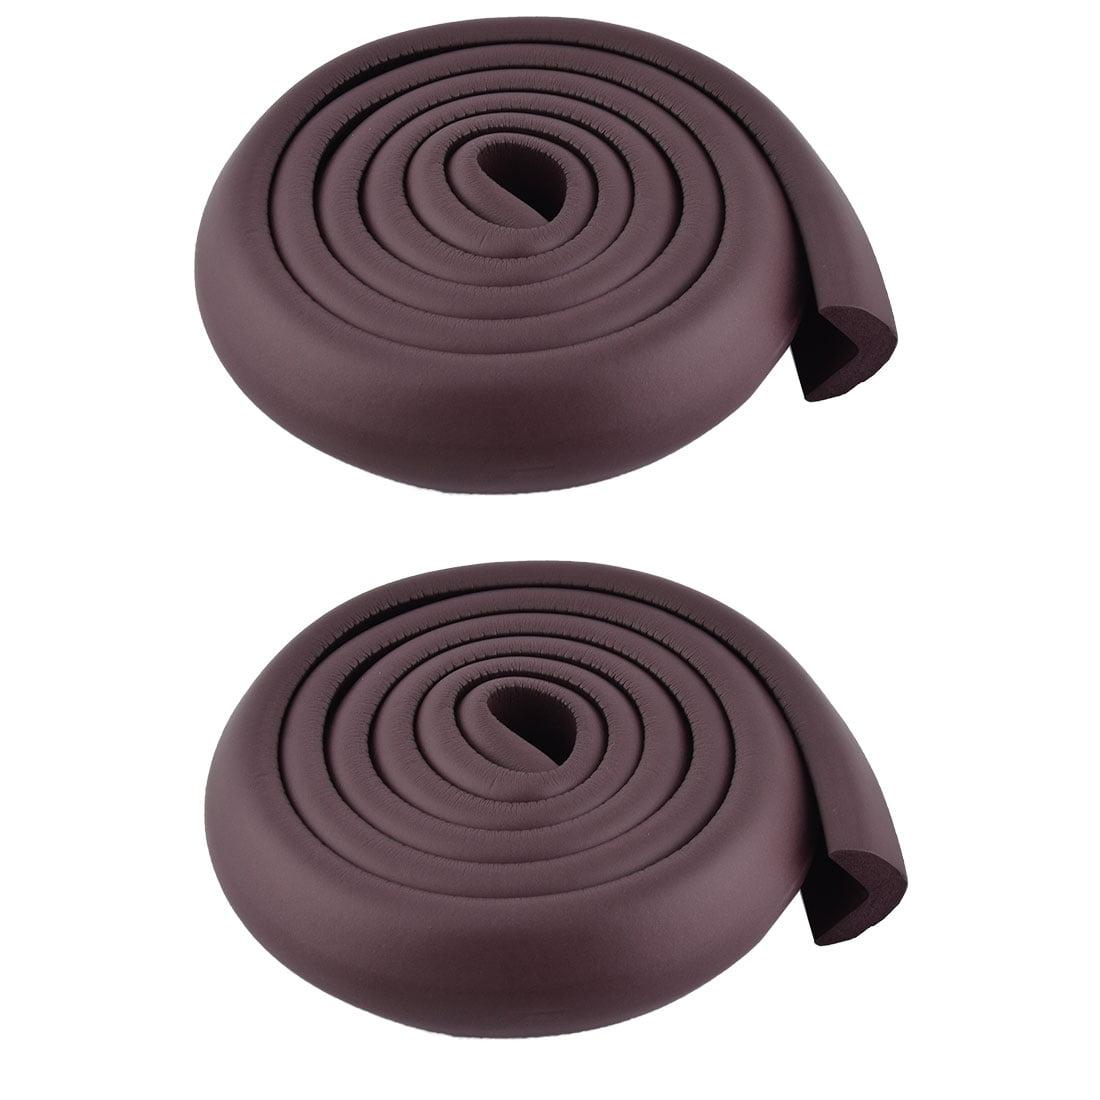 Flat Dresser Foam Rubber Safety Corner Edge Protector Cushion Dark Brown 2 Pcs